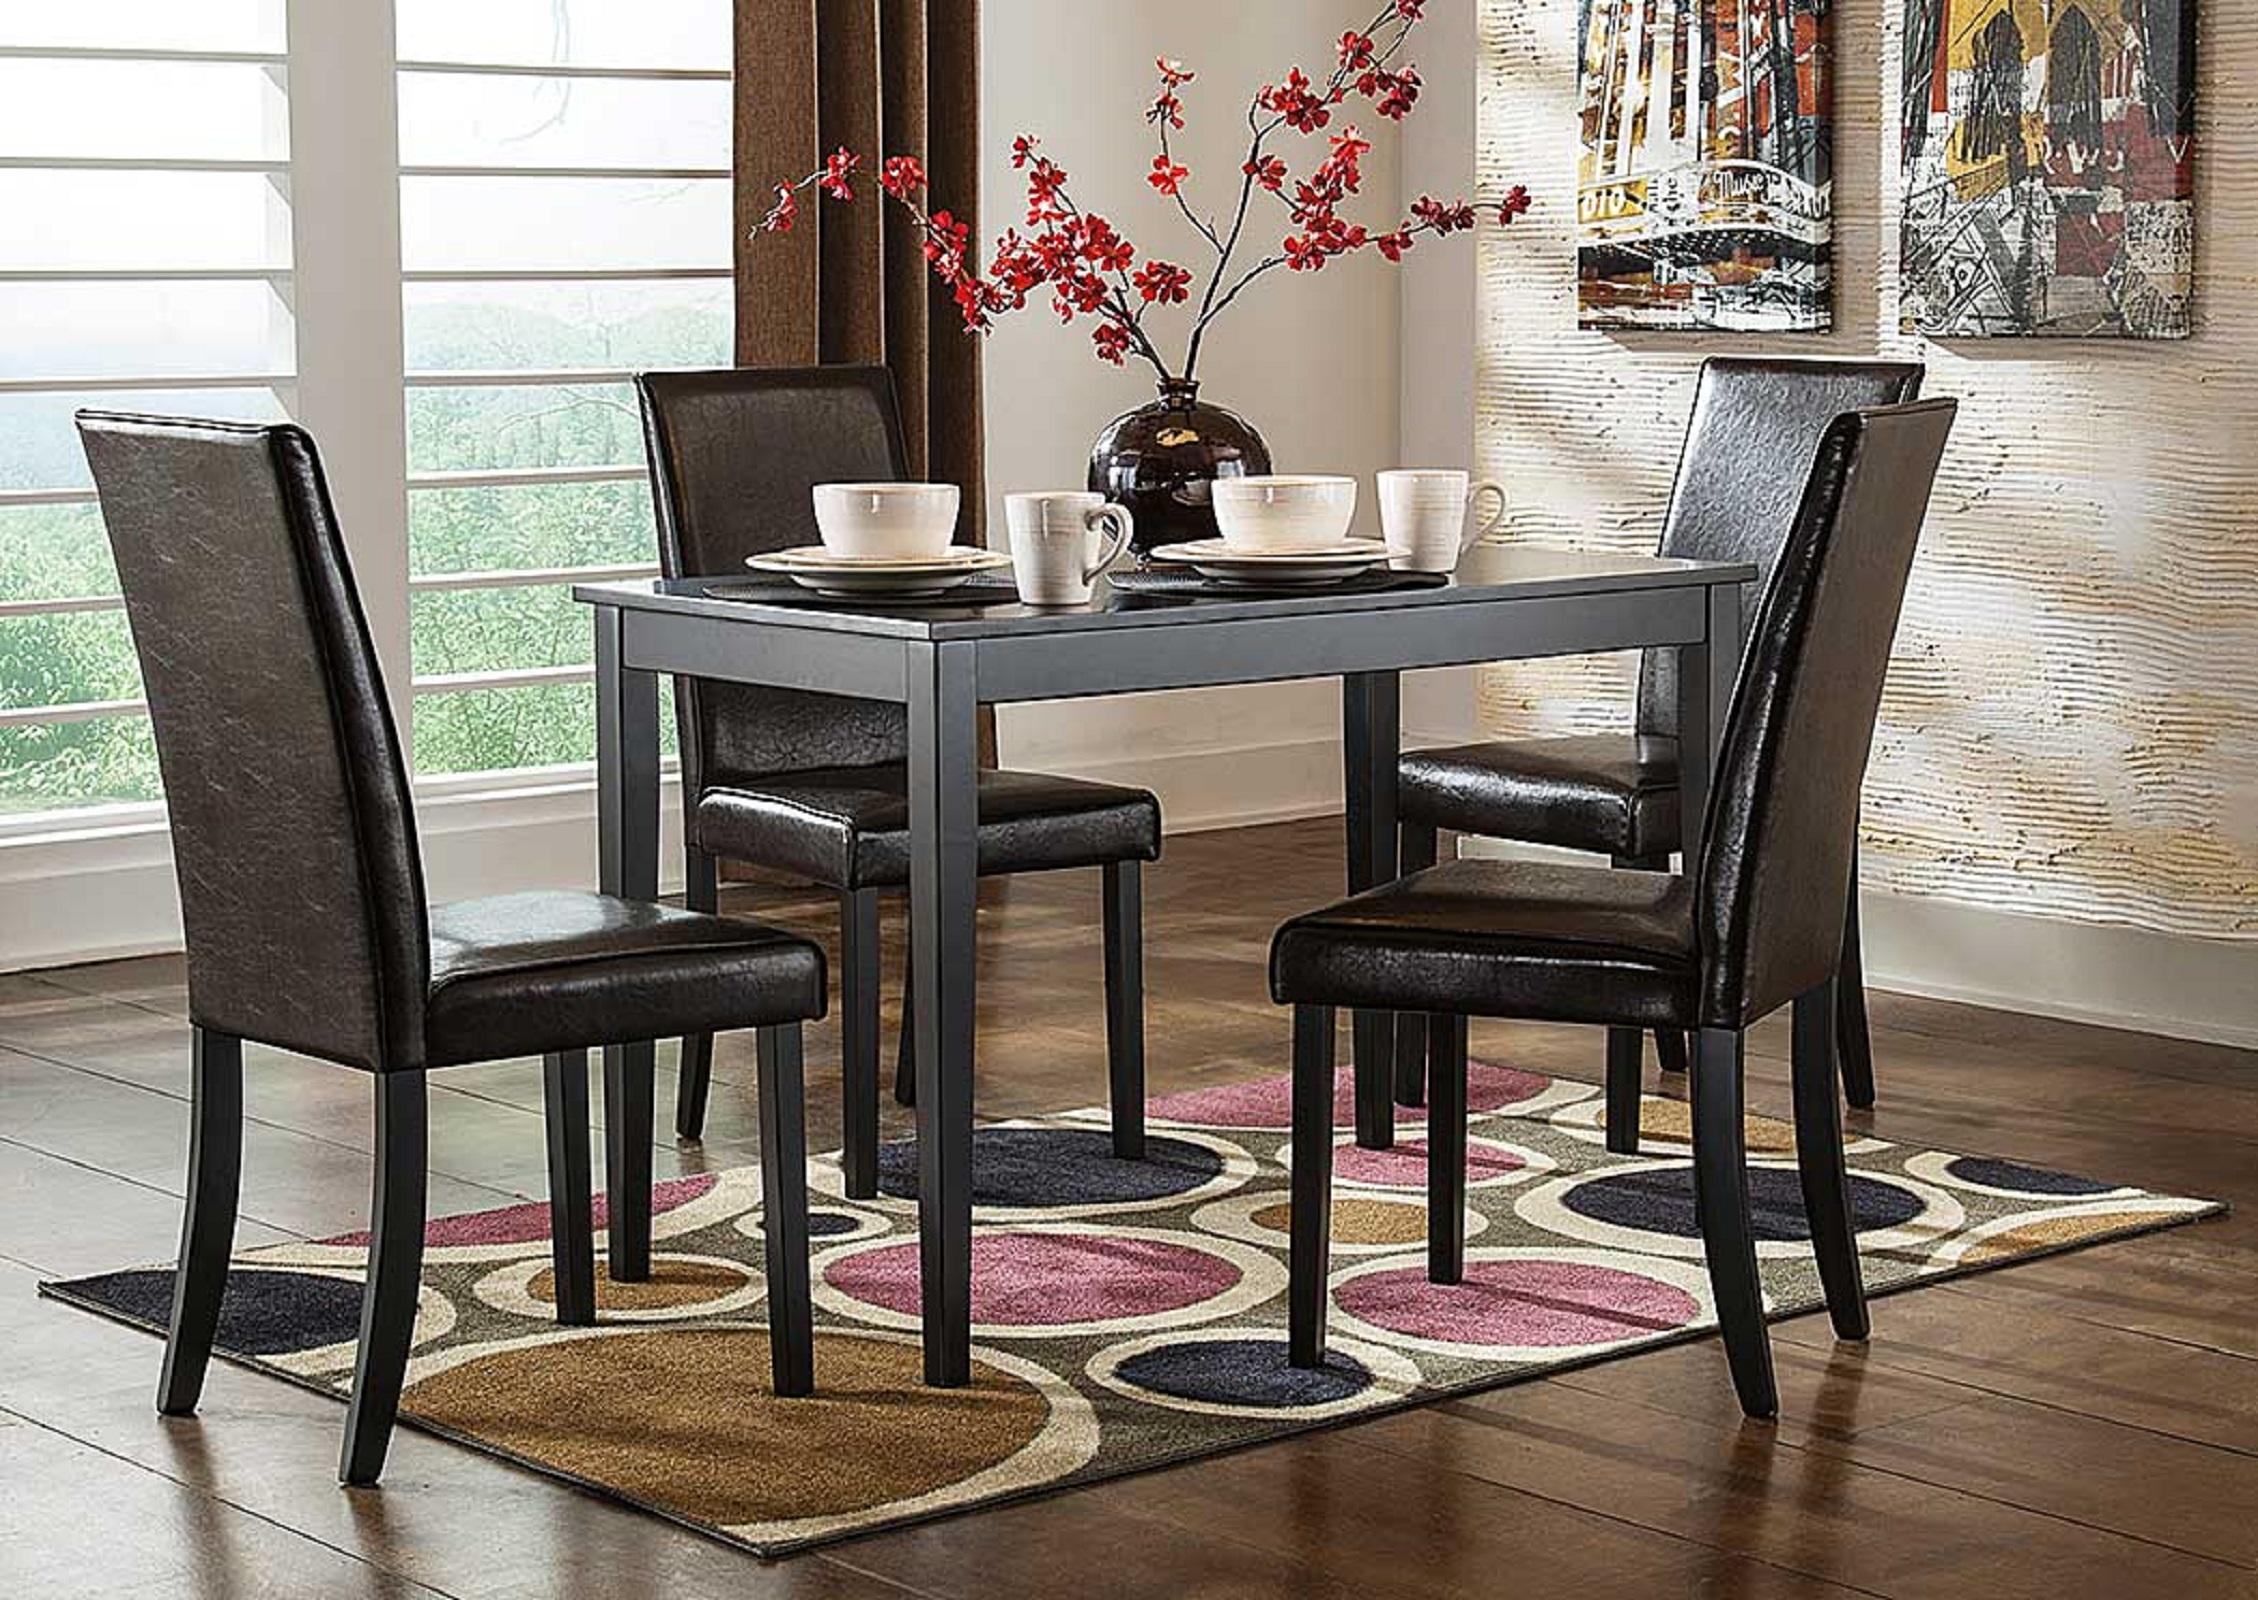 Kimonte Rectangular Dining Table w/ 4 Dark Brown Chairs